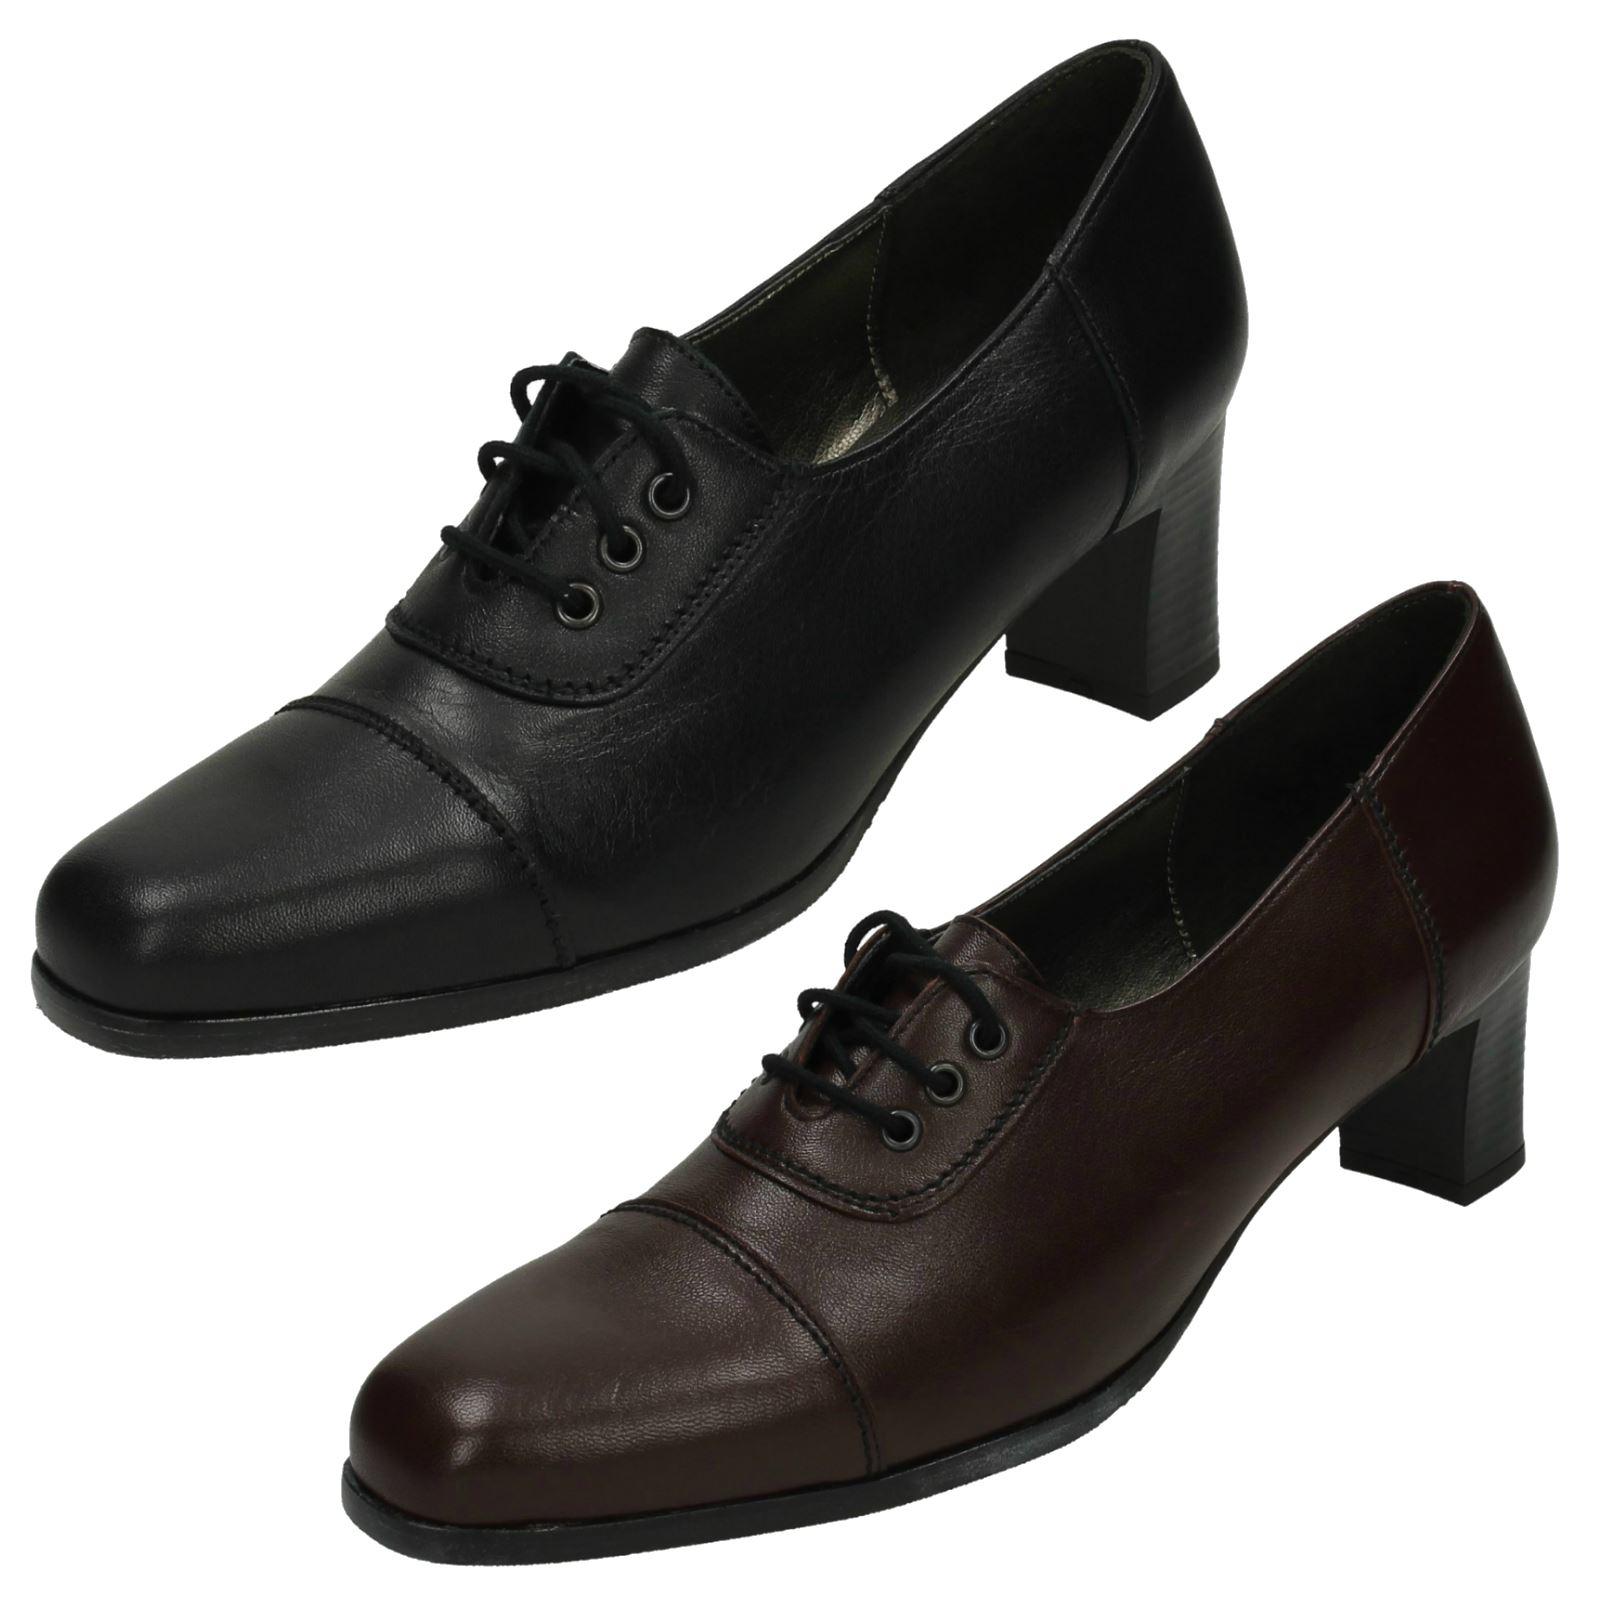 Ladies Nil Simile Narrow Fitting Smart Shoes Kansas Ebay